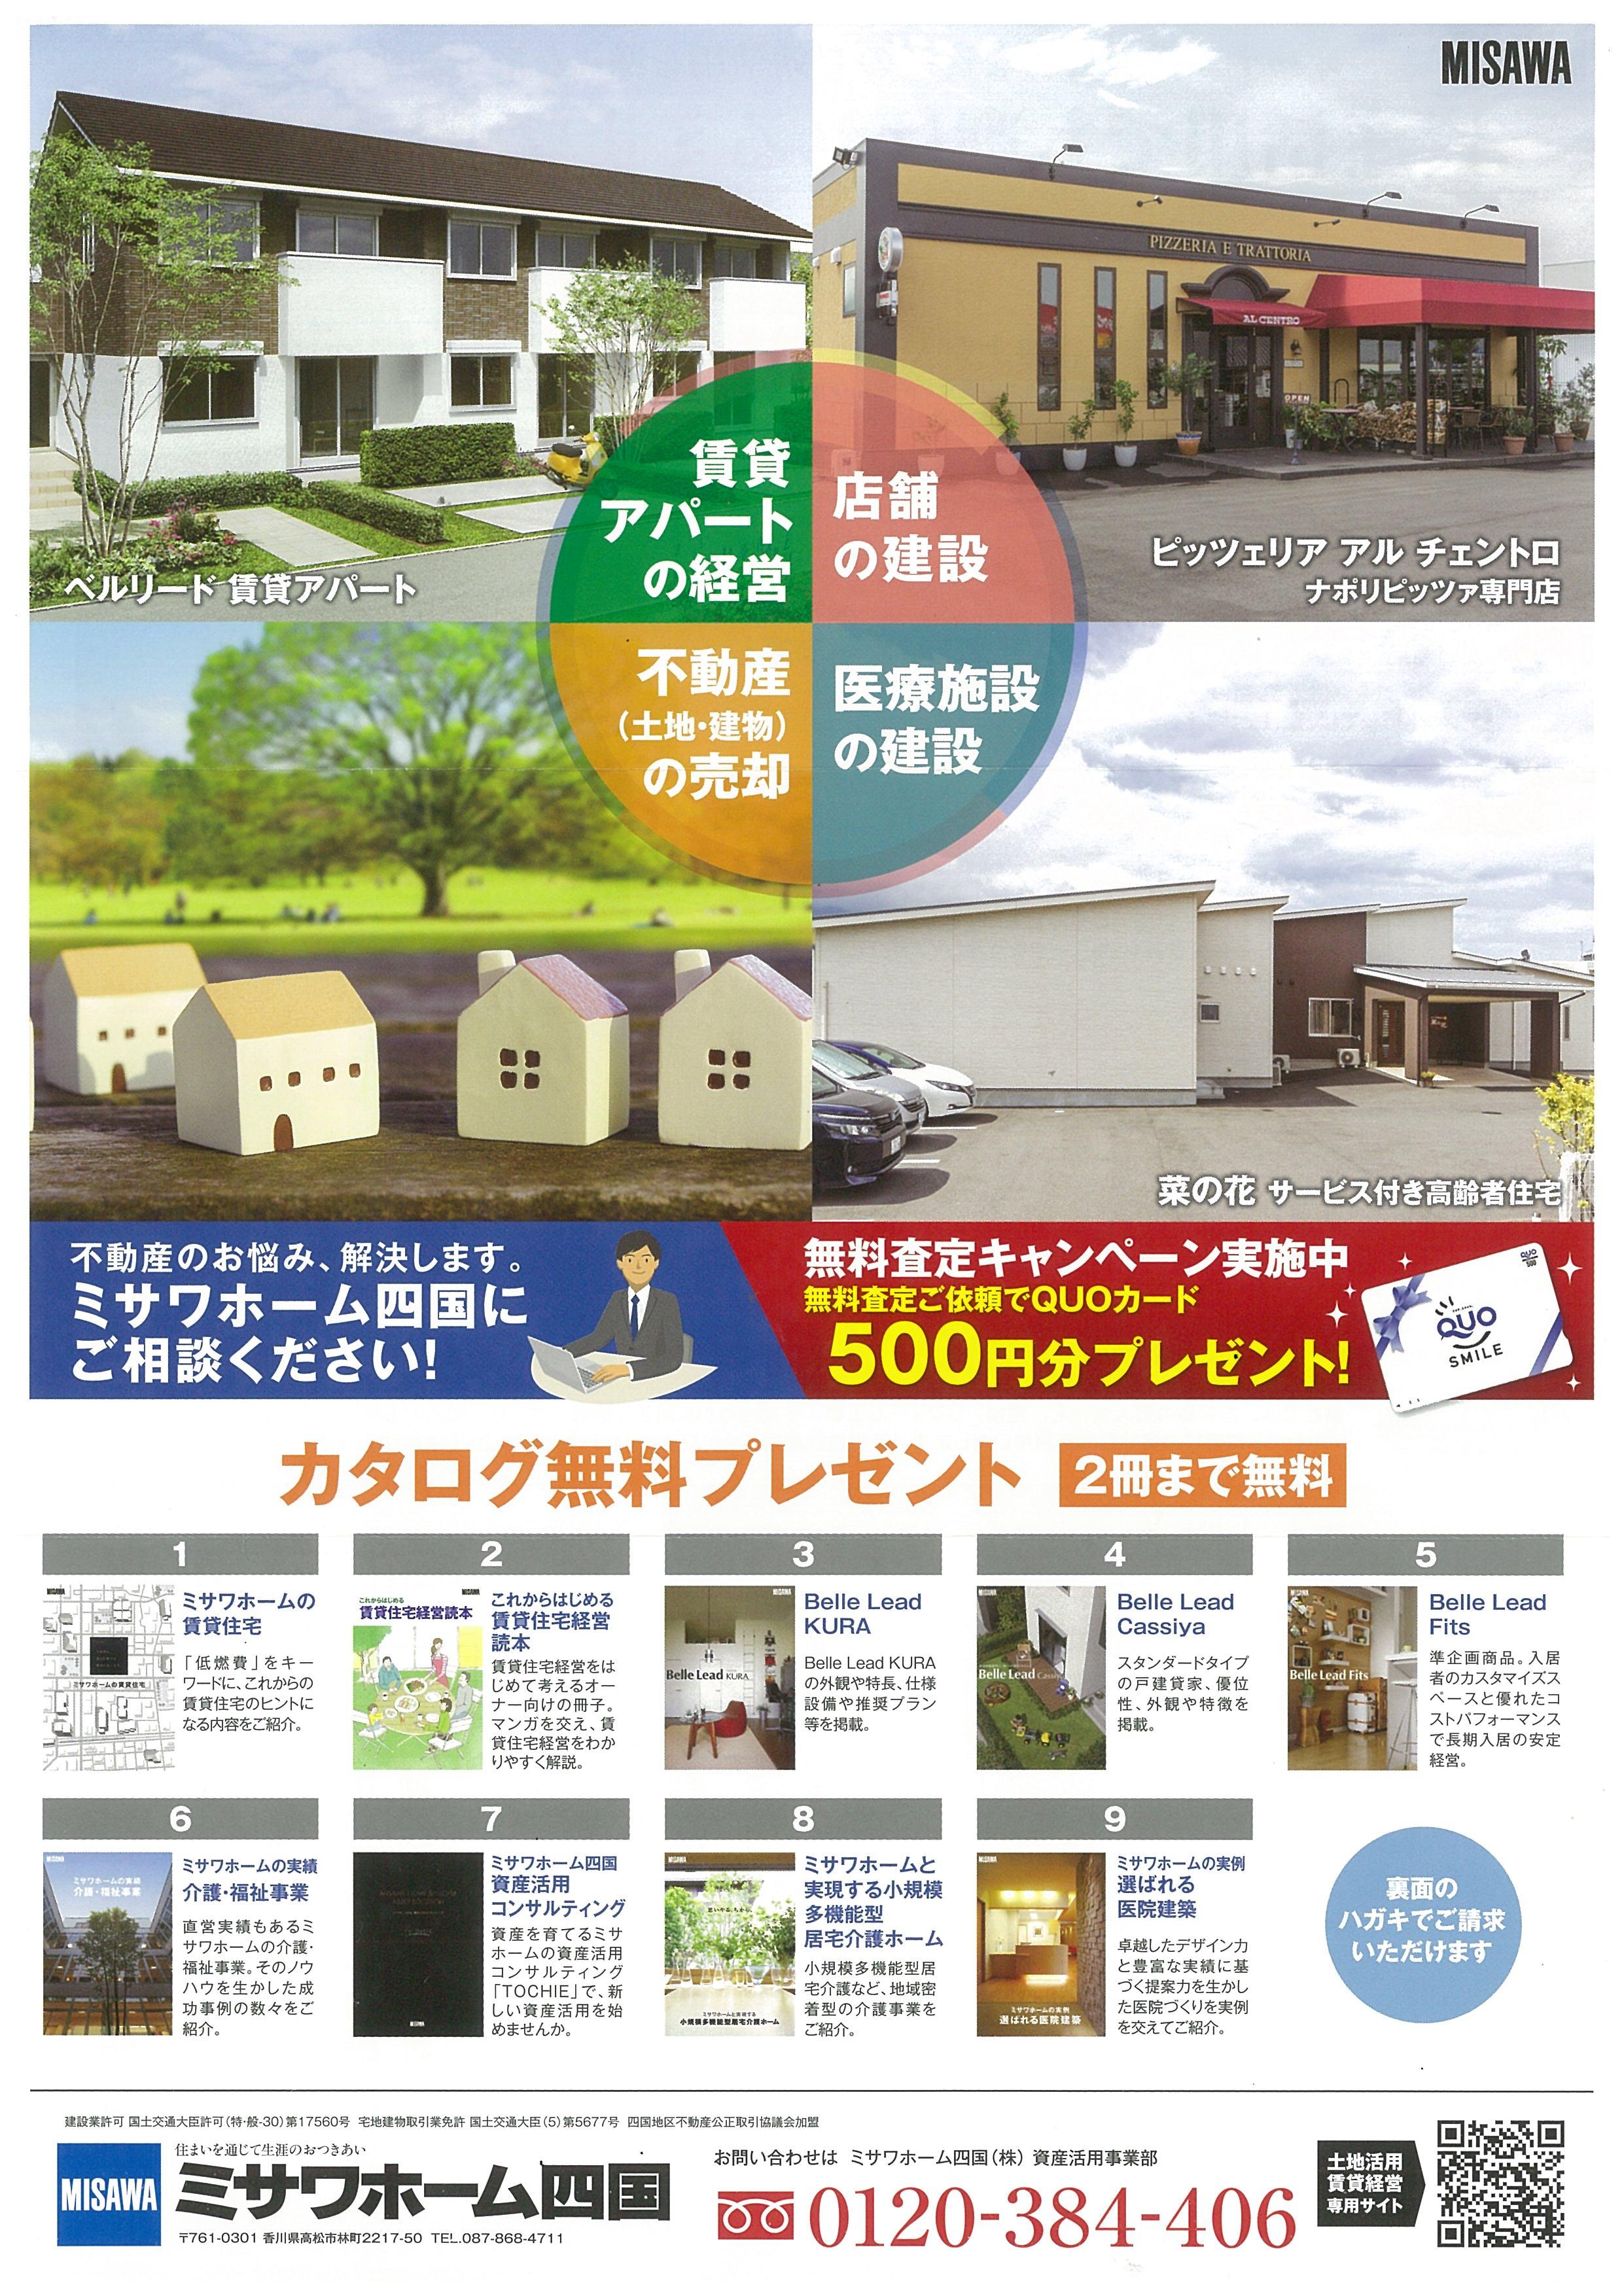 http://shikoku.misawa.co.jp/area_kouchi/%E7%89%B9%E5%BB%BA.jpg